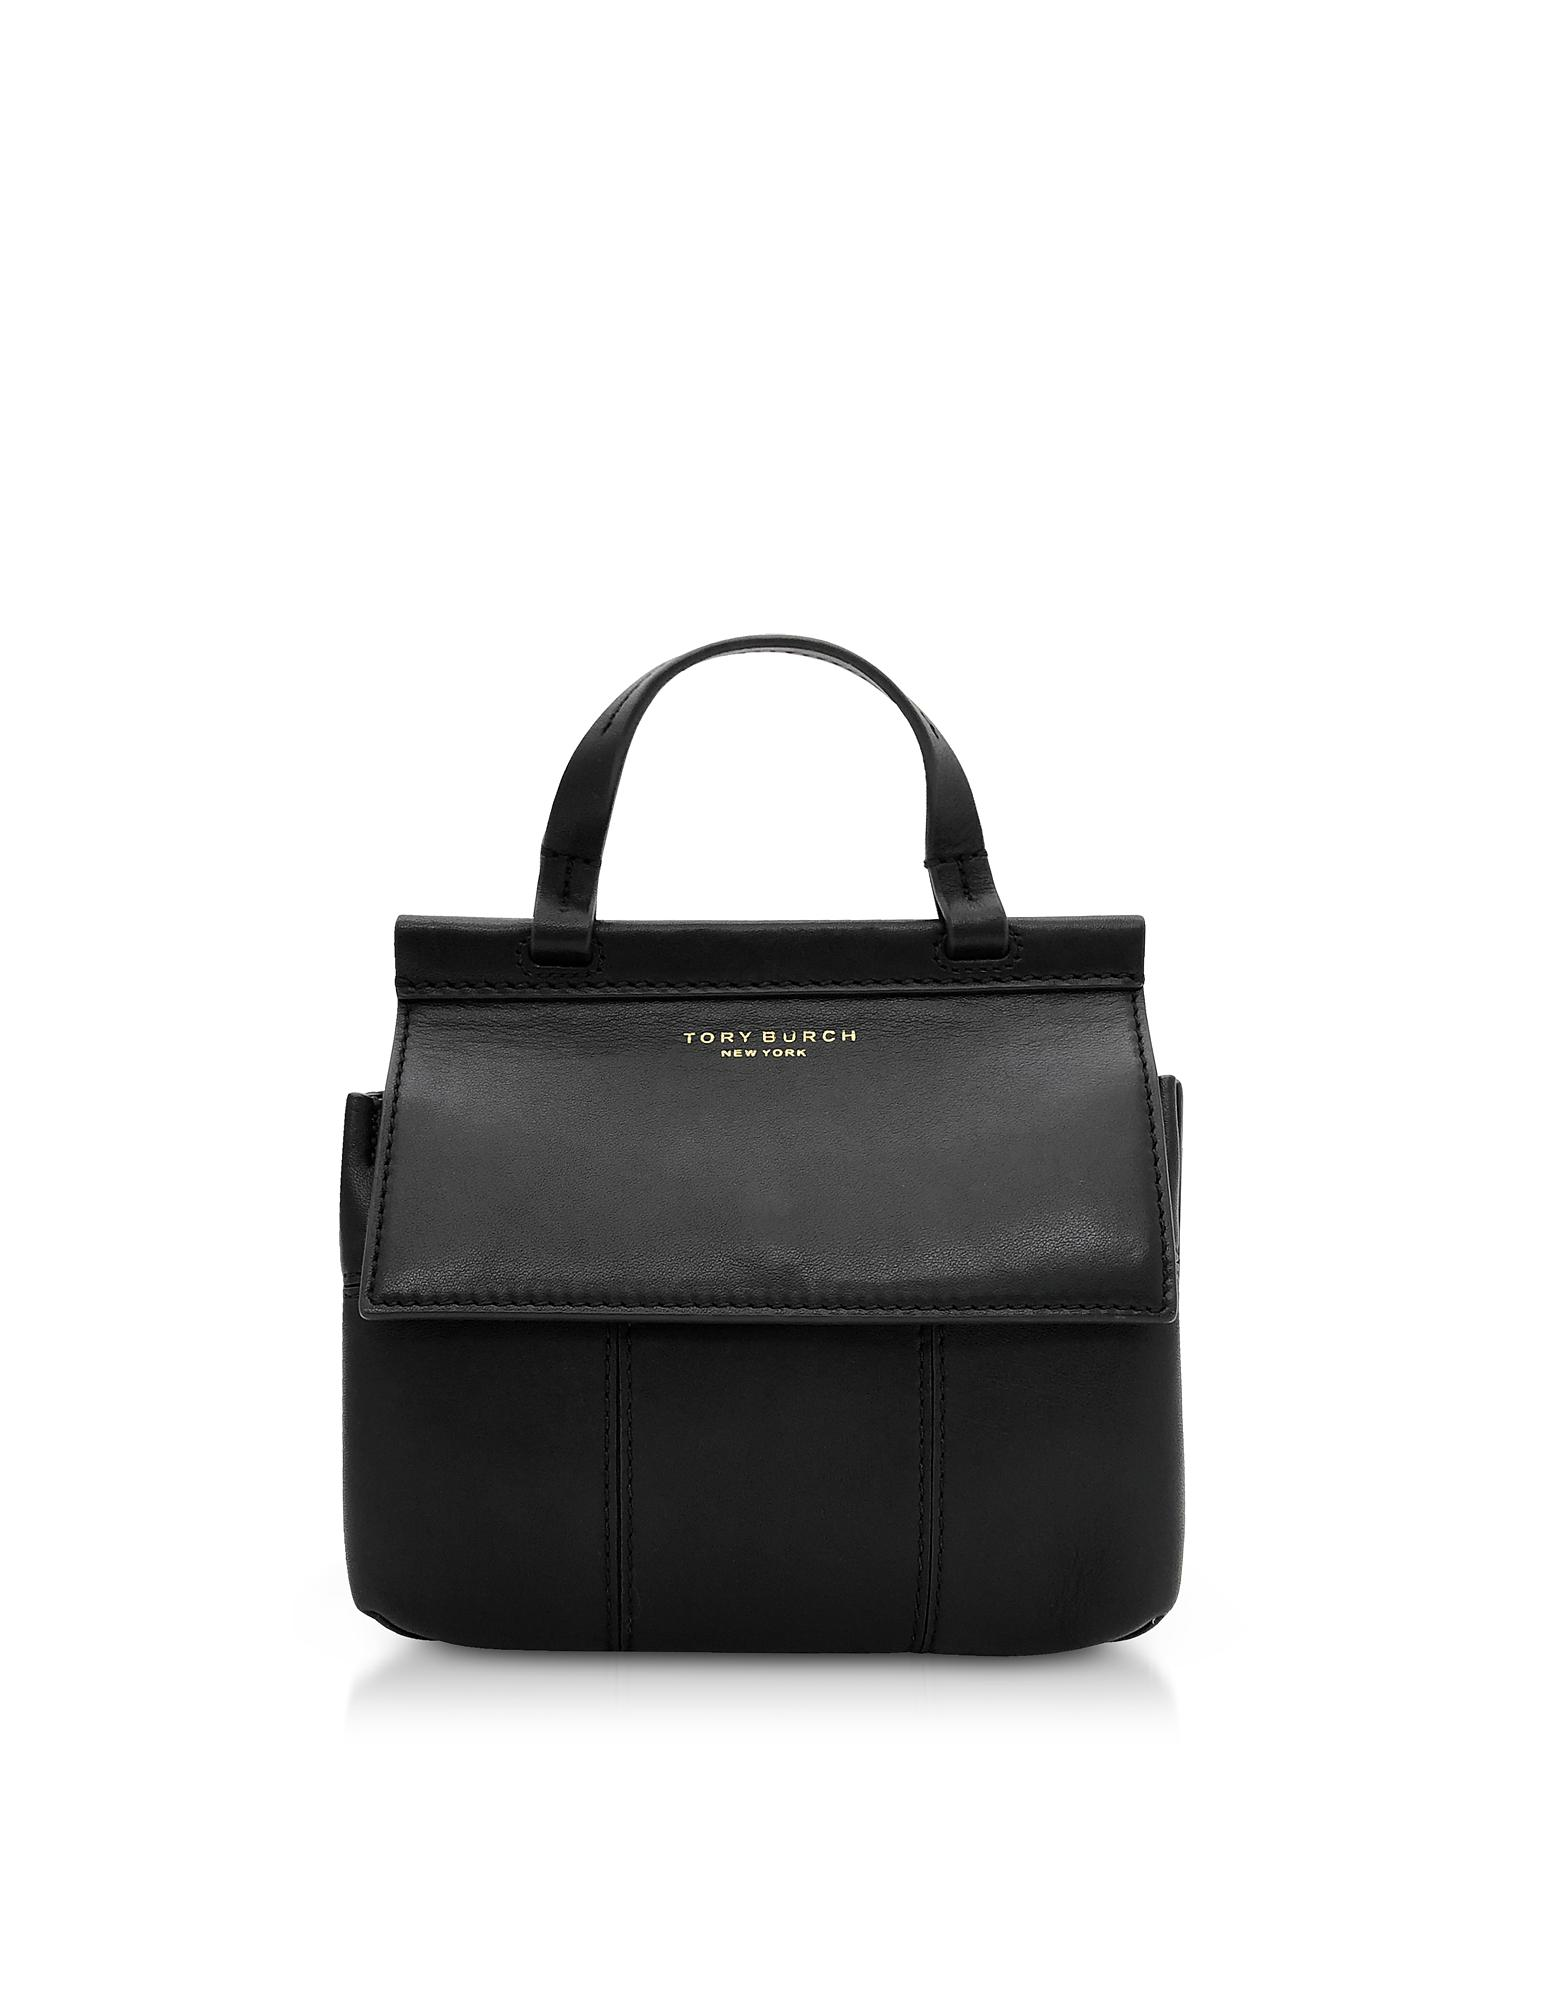 f833d8bf5be6 Lyst - Tory Burch Black Genuine Leather Block-t Mini Satchel Bag in ...